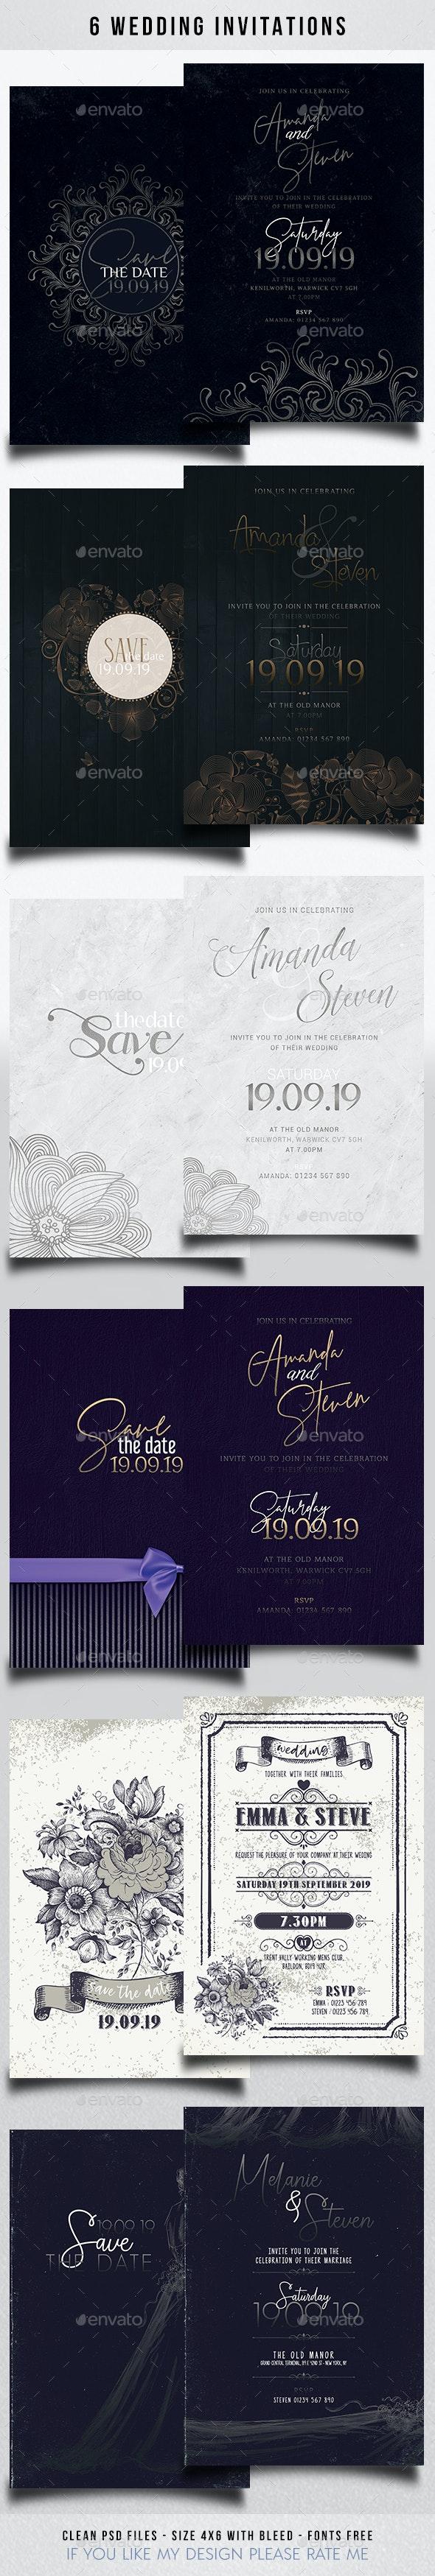 6 Wedding Invitation - Wedding Greeting Cards